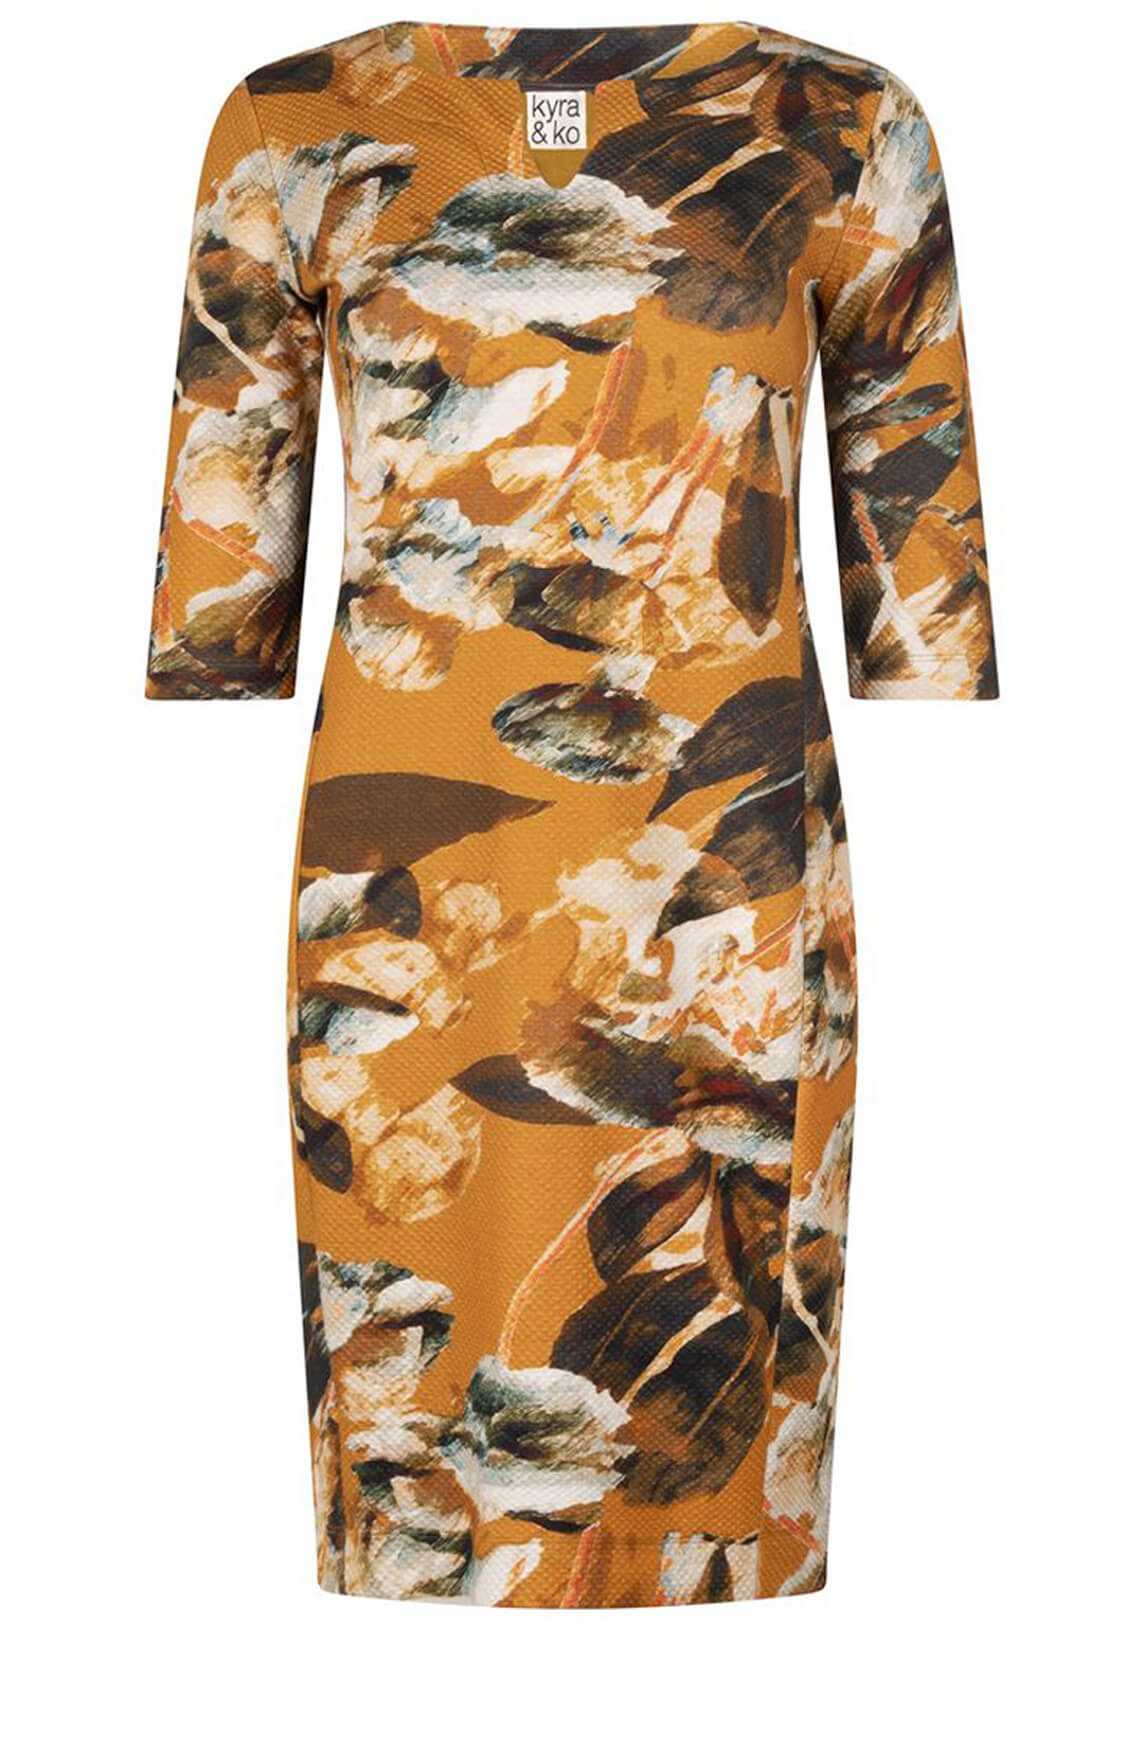 Kyra & Ko Dames Delta jurk Oranje